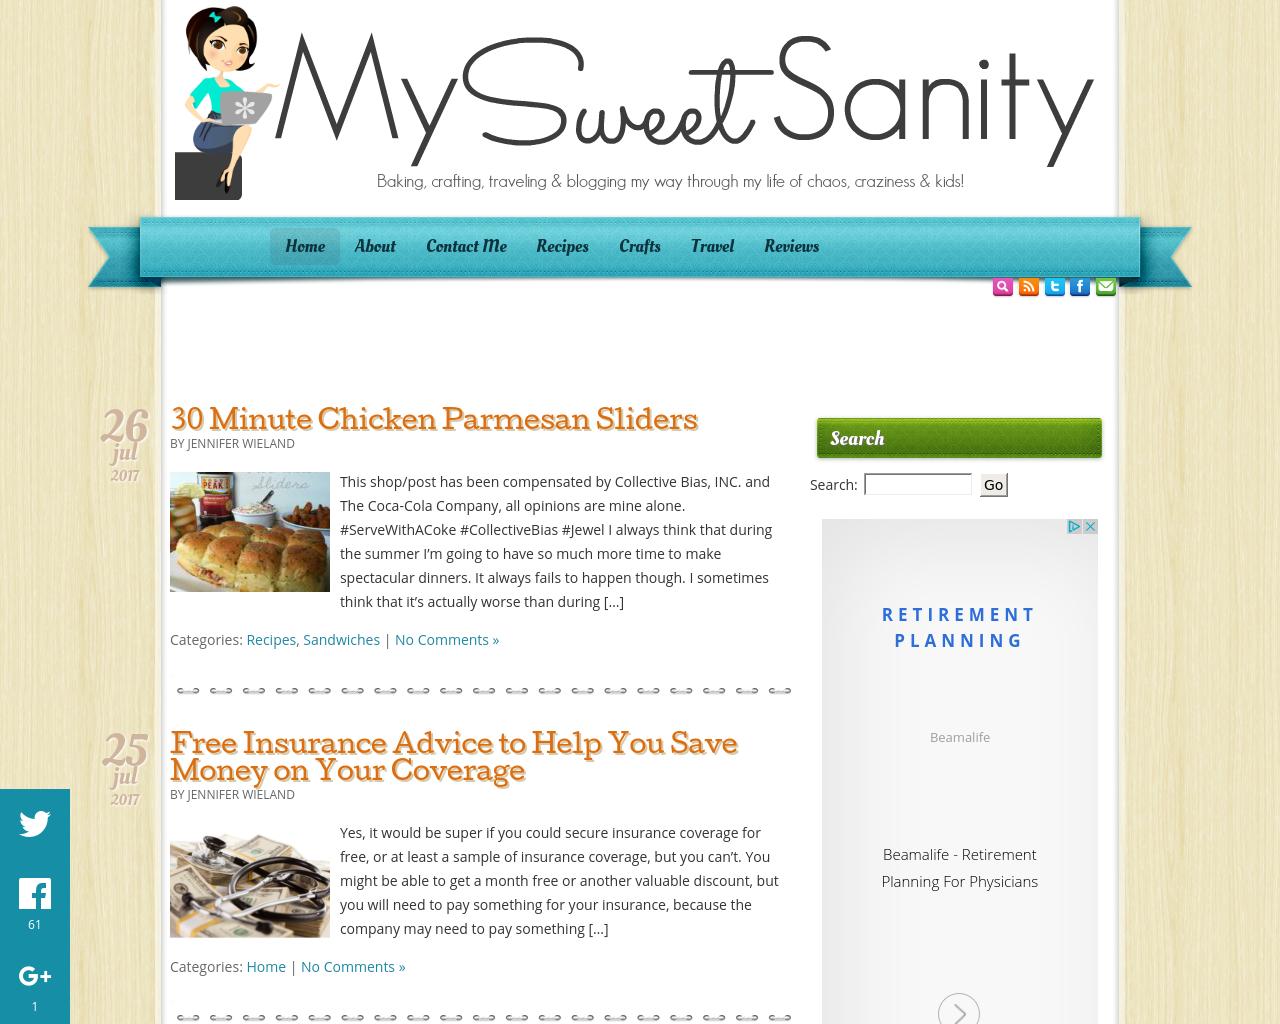 My-Sweet-Sanity-Advertising-Reviews-Pricing